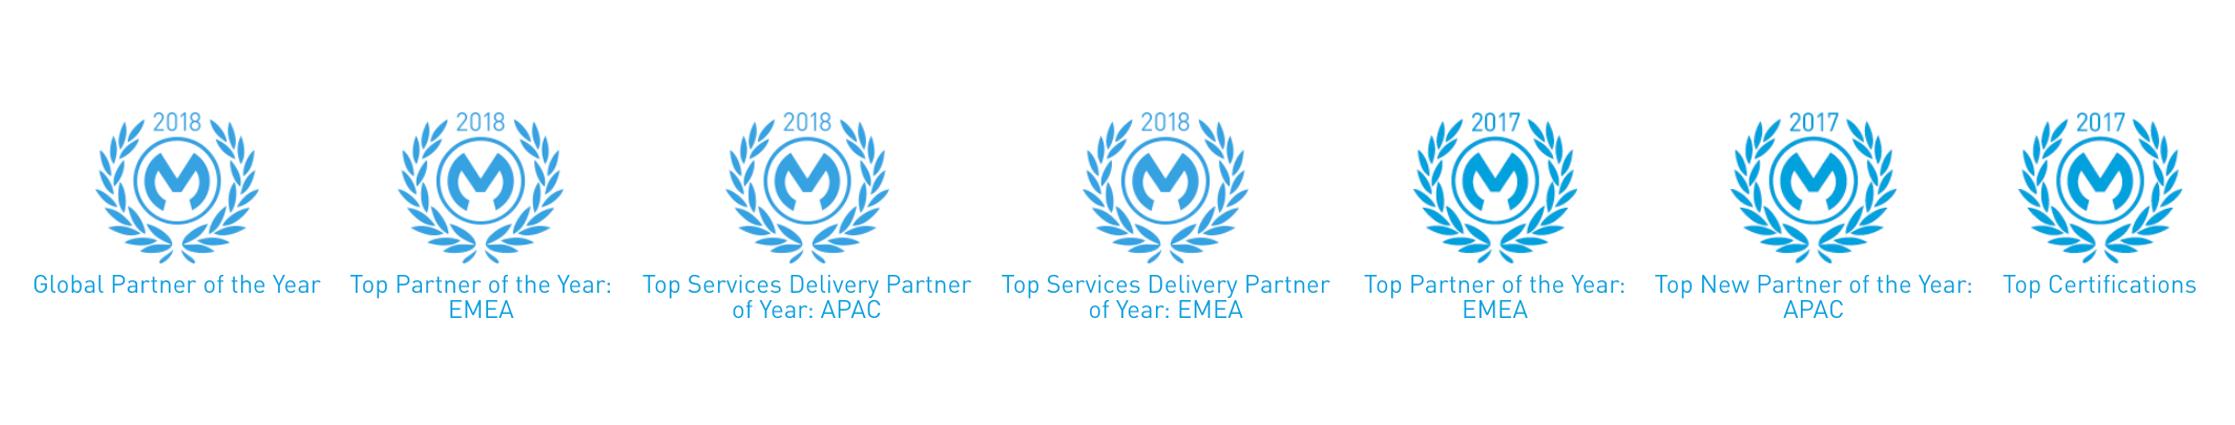 Capgemini named MuleSoft Partner of the year 2018 and 2017